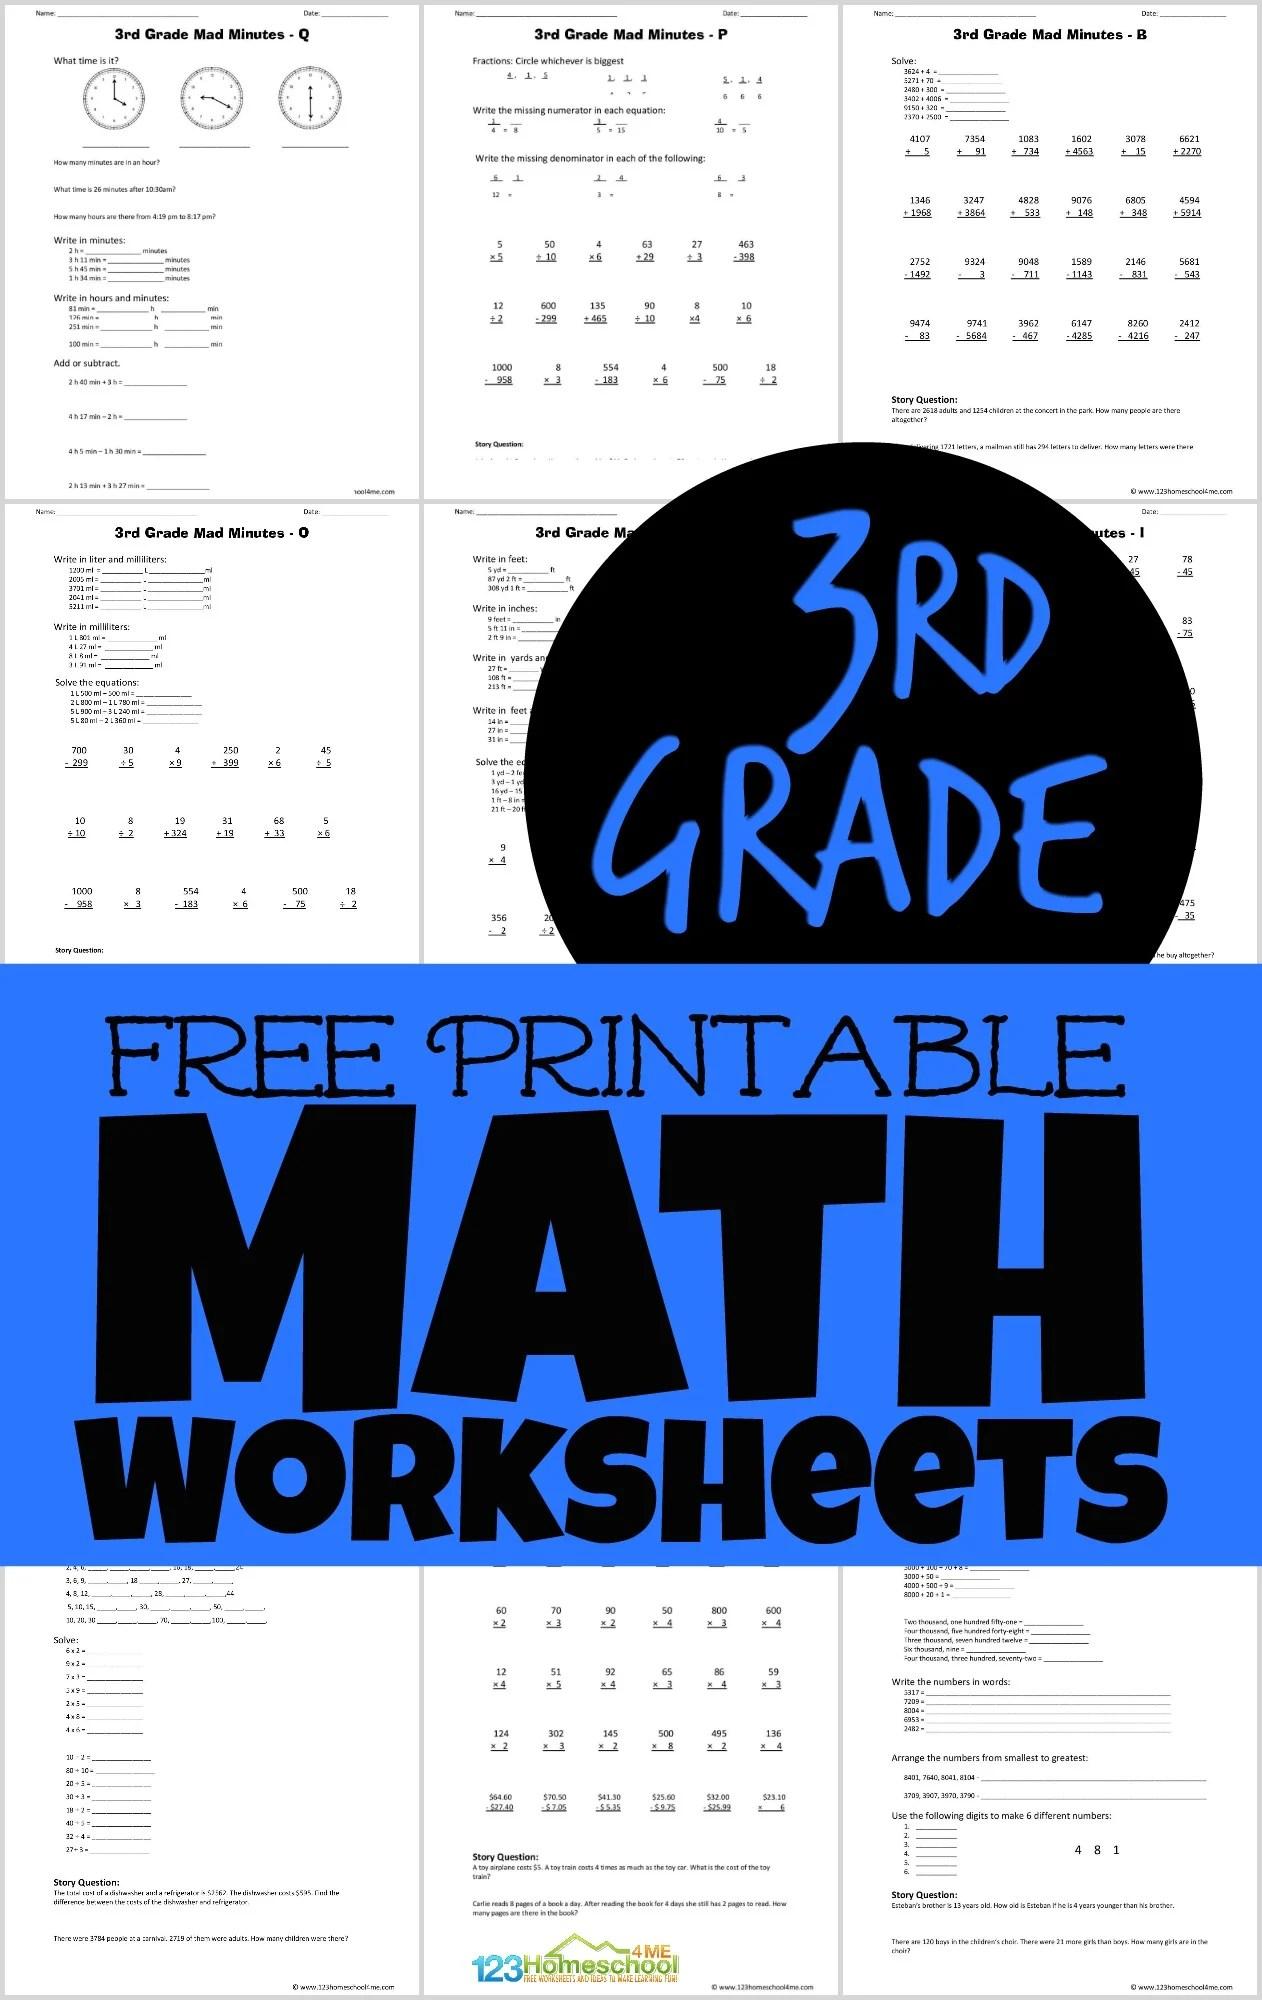 Free Printable 3rd Grade Math Worksheets